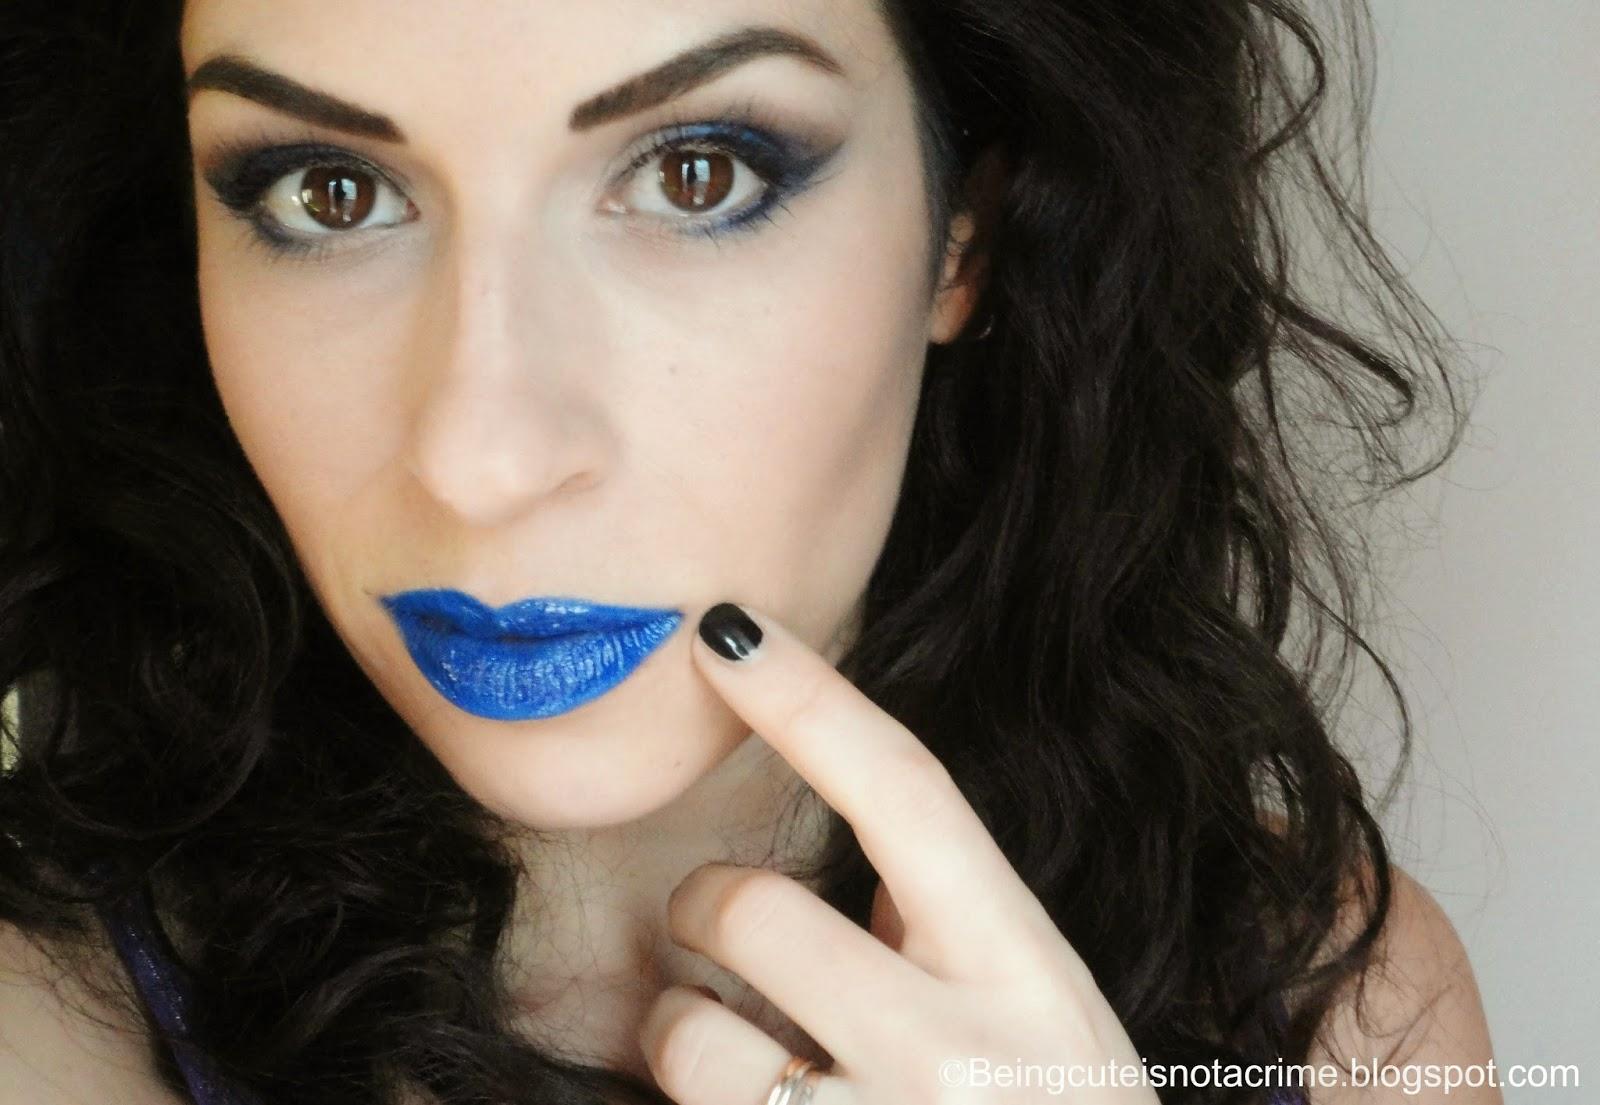 http://beingcuteisnotacrime.blogspot.nl/2014/03/blue-fixation-make-up-look.html